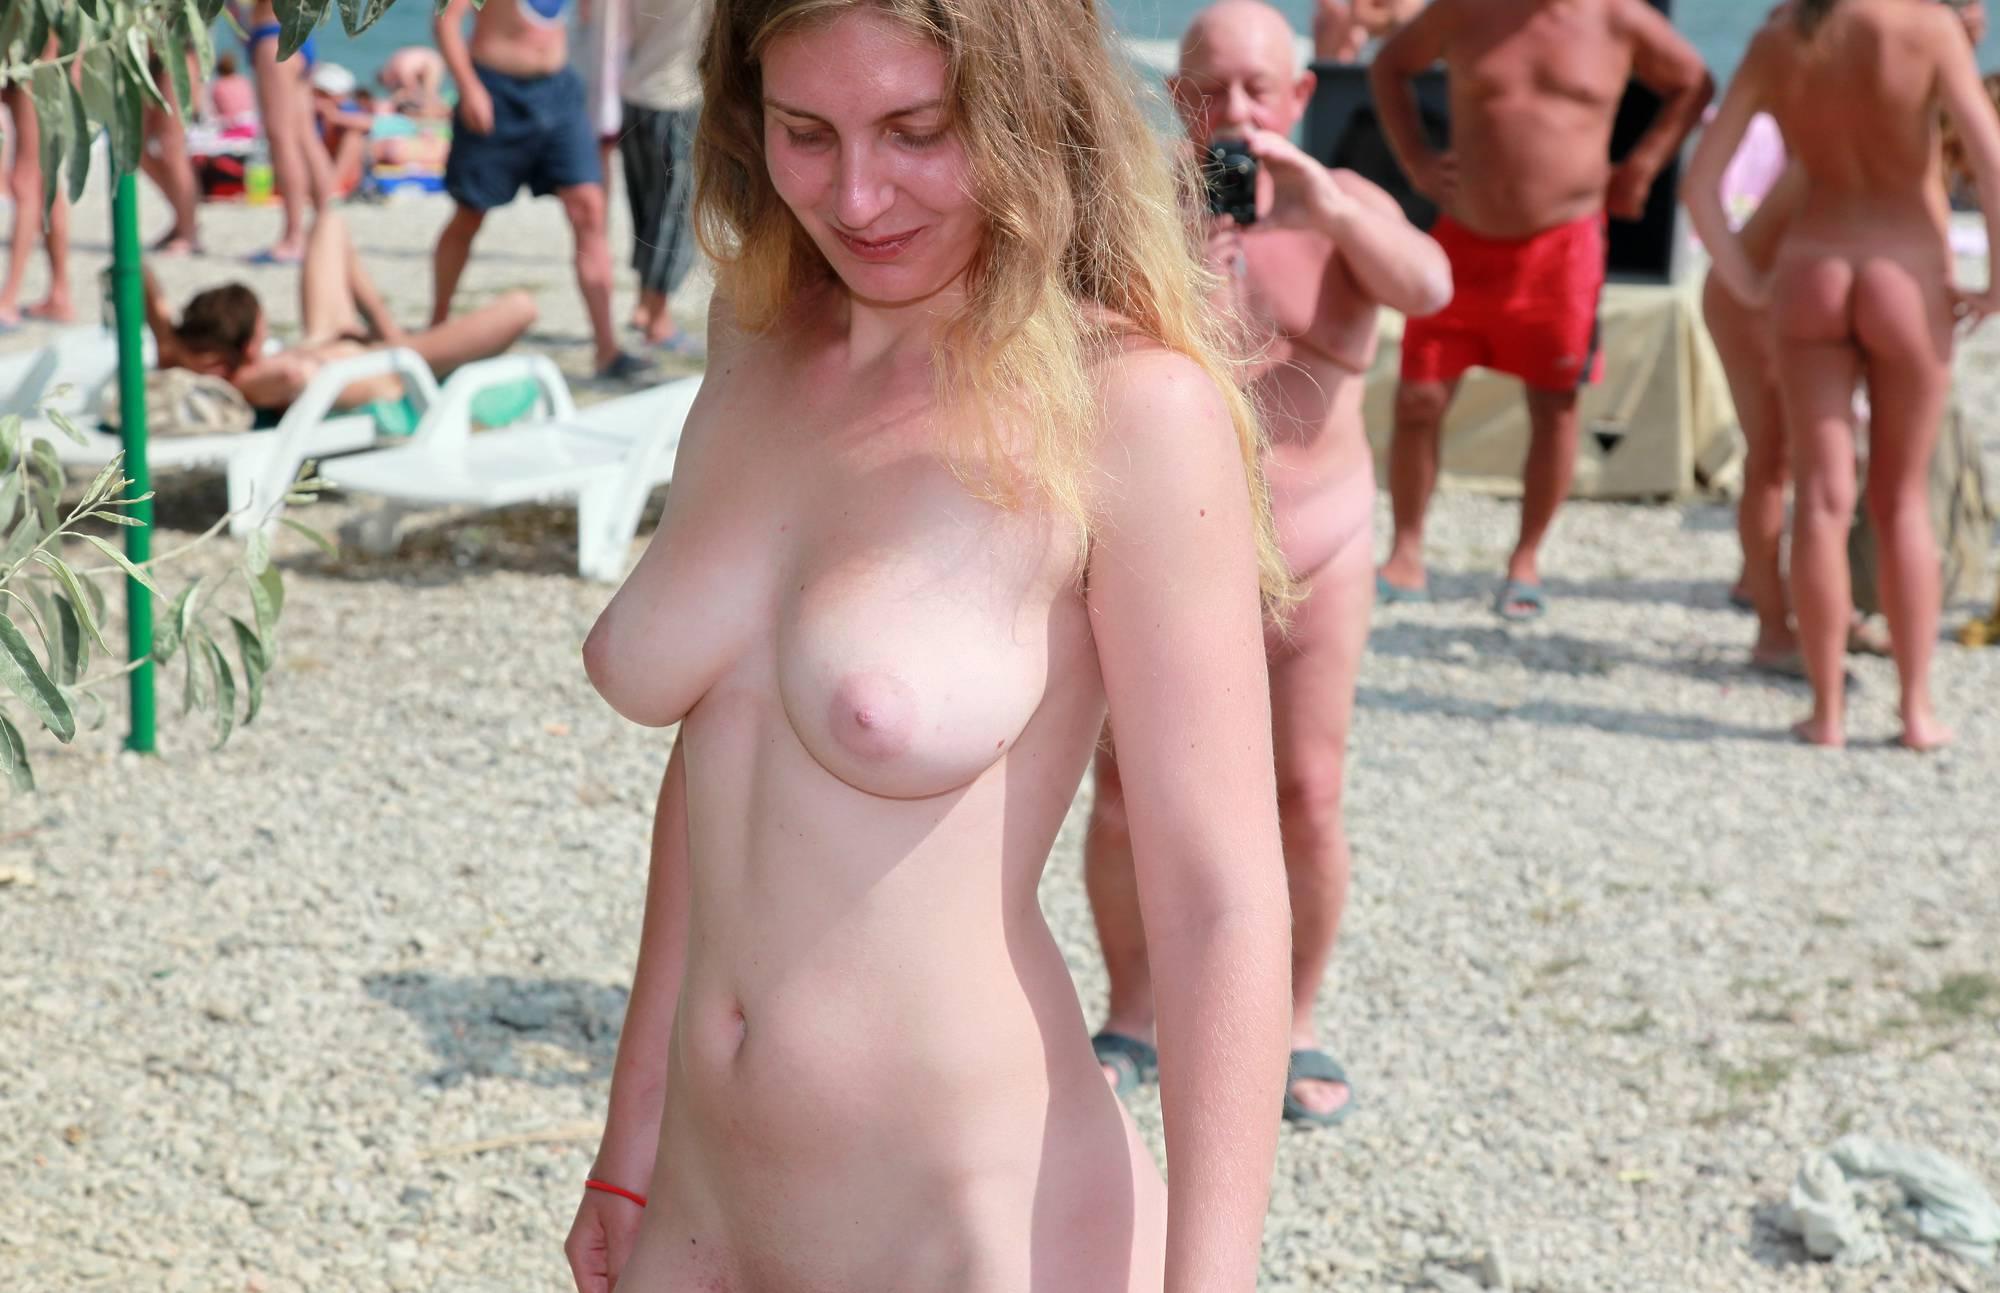 Nudist Pics Parents Nudist Beach Still - 2